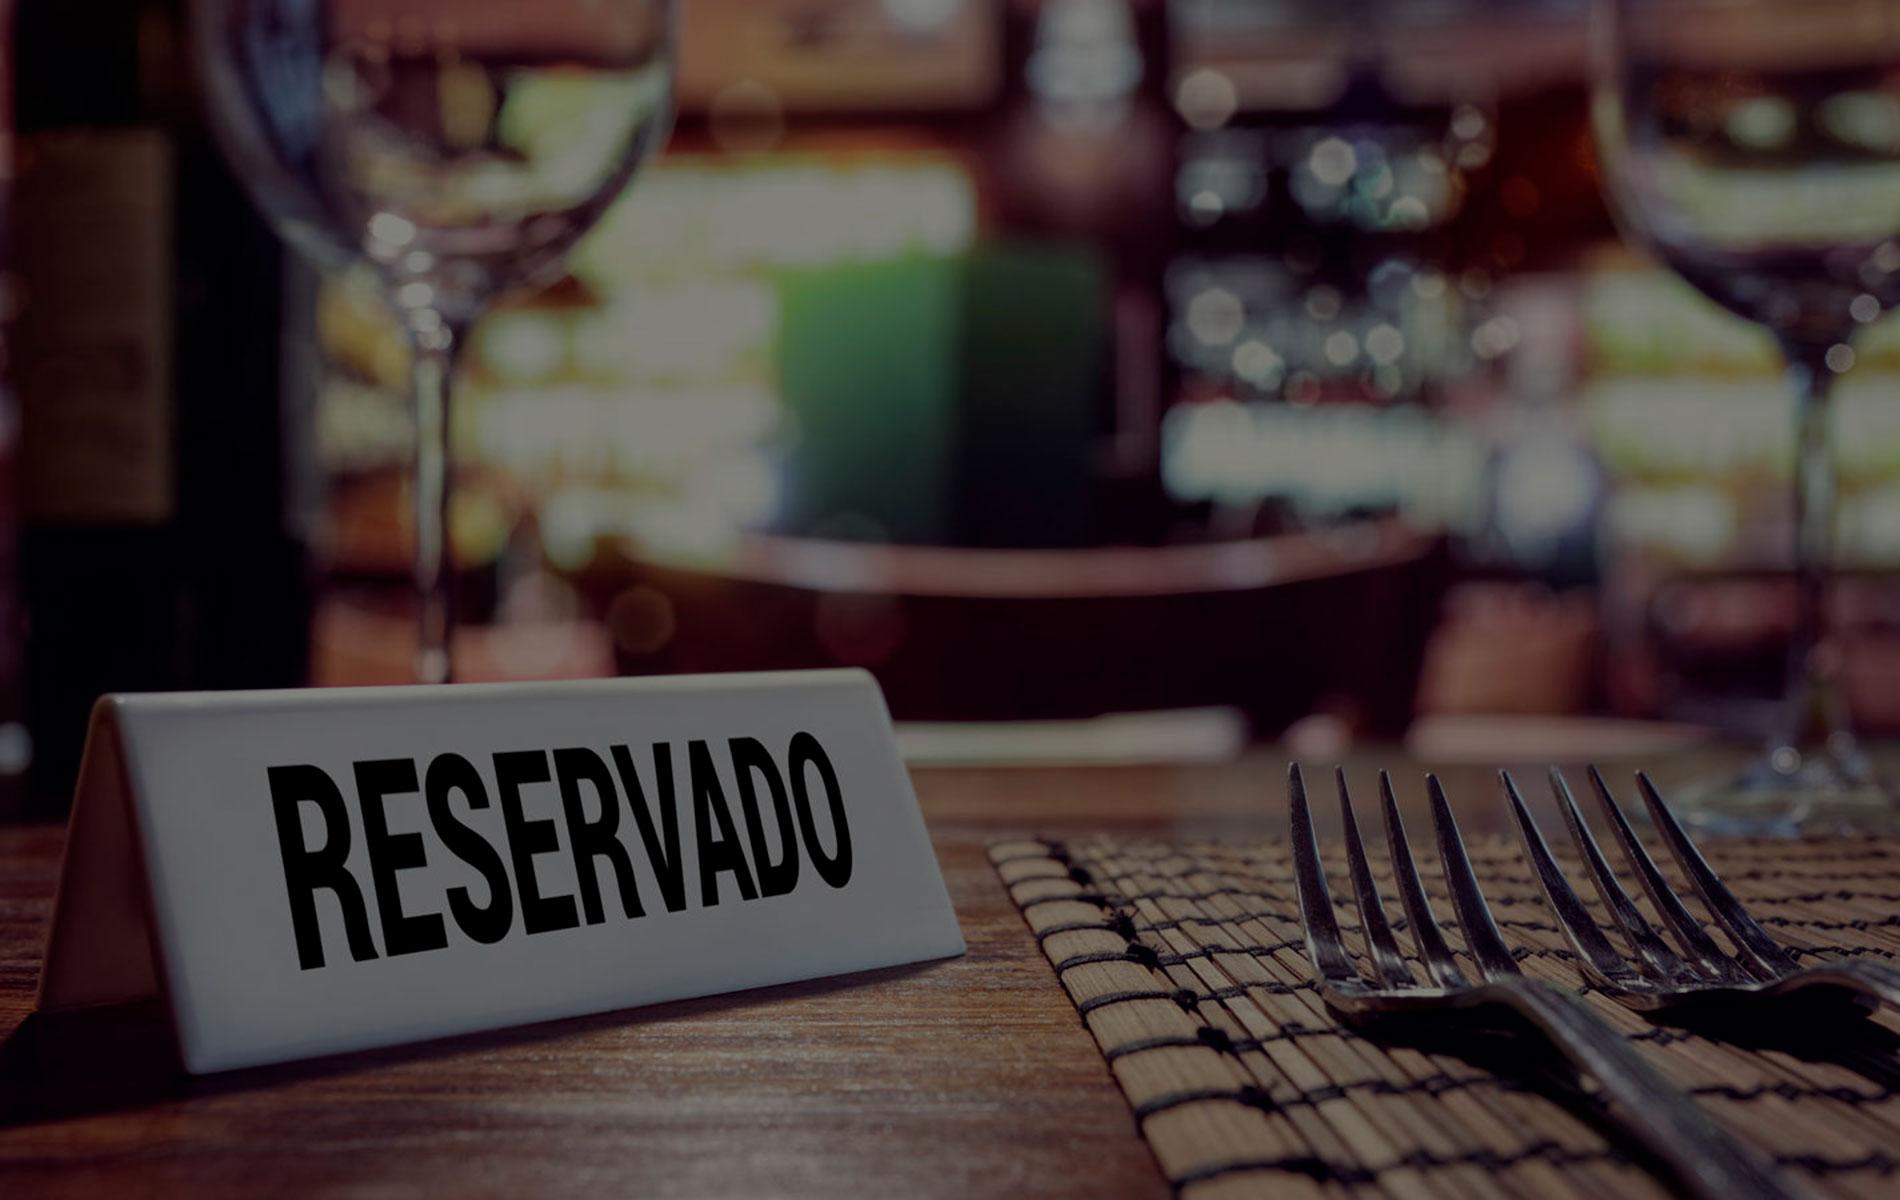 Realiza una reserva